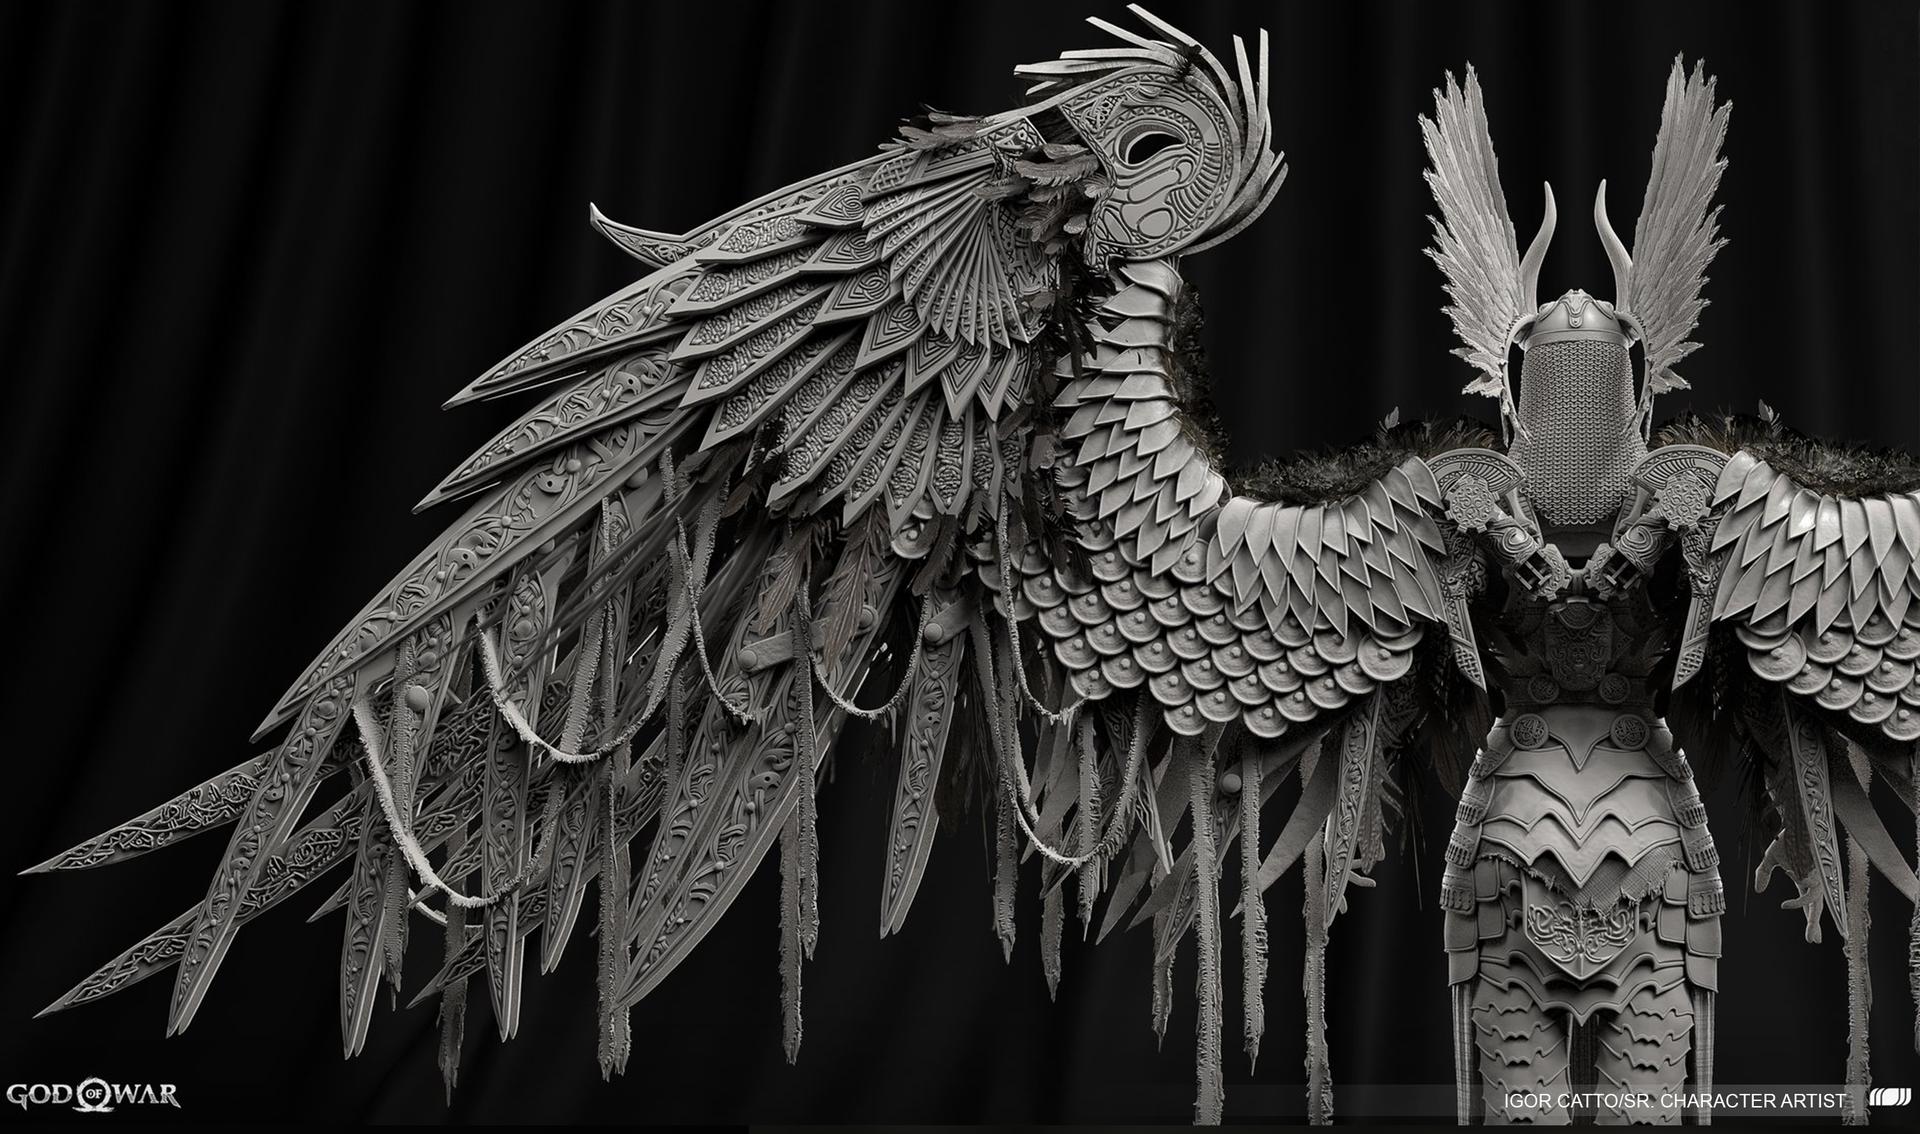 God of War – Valkyrie Wings Design